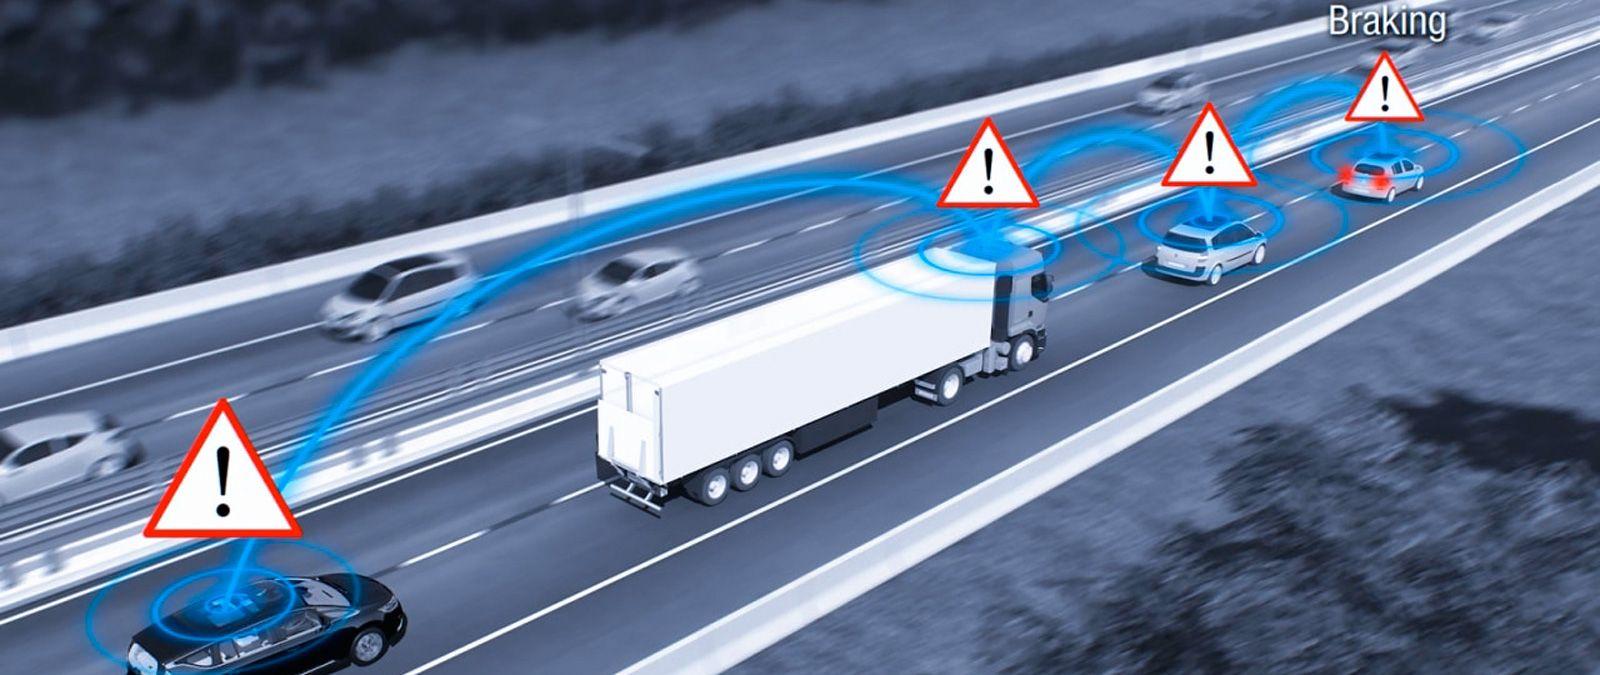 Renault - improving traffic safety